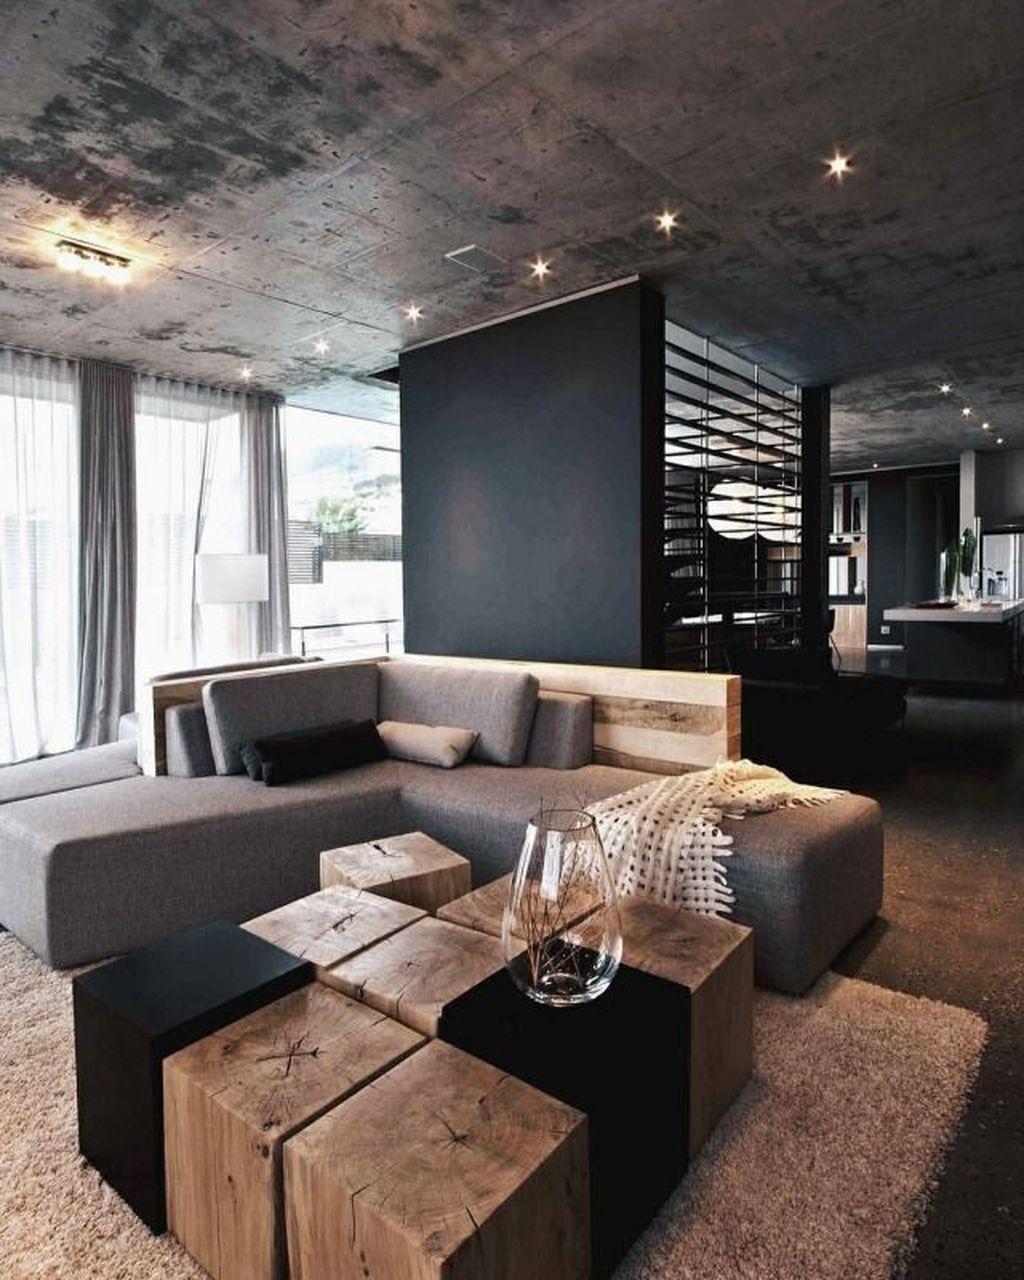 Admirable Modern Interior Design Ideas You Never Seen Before 07